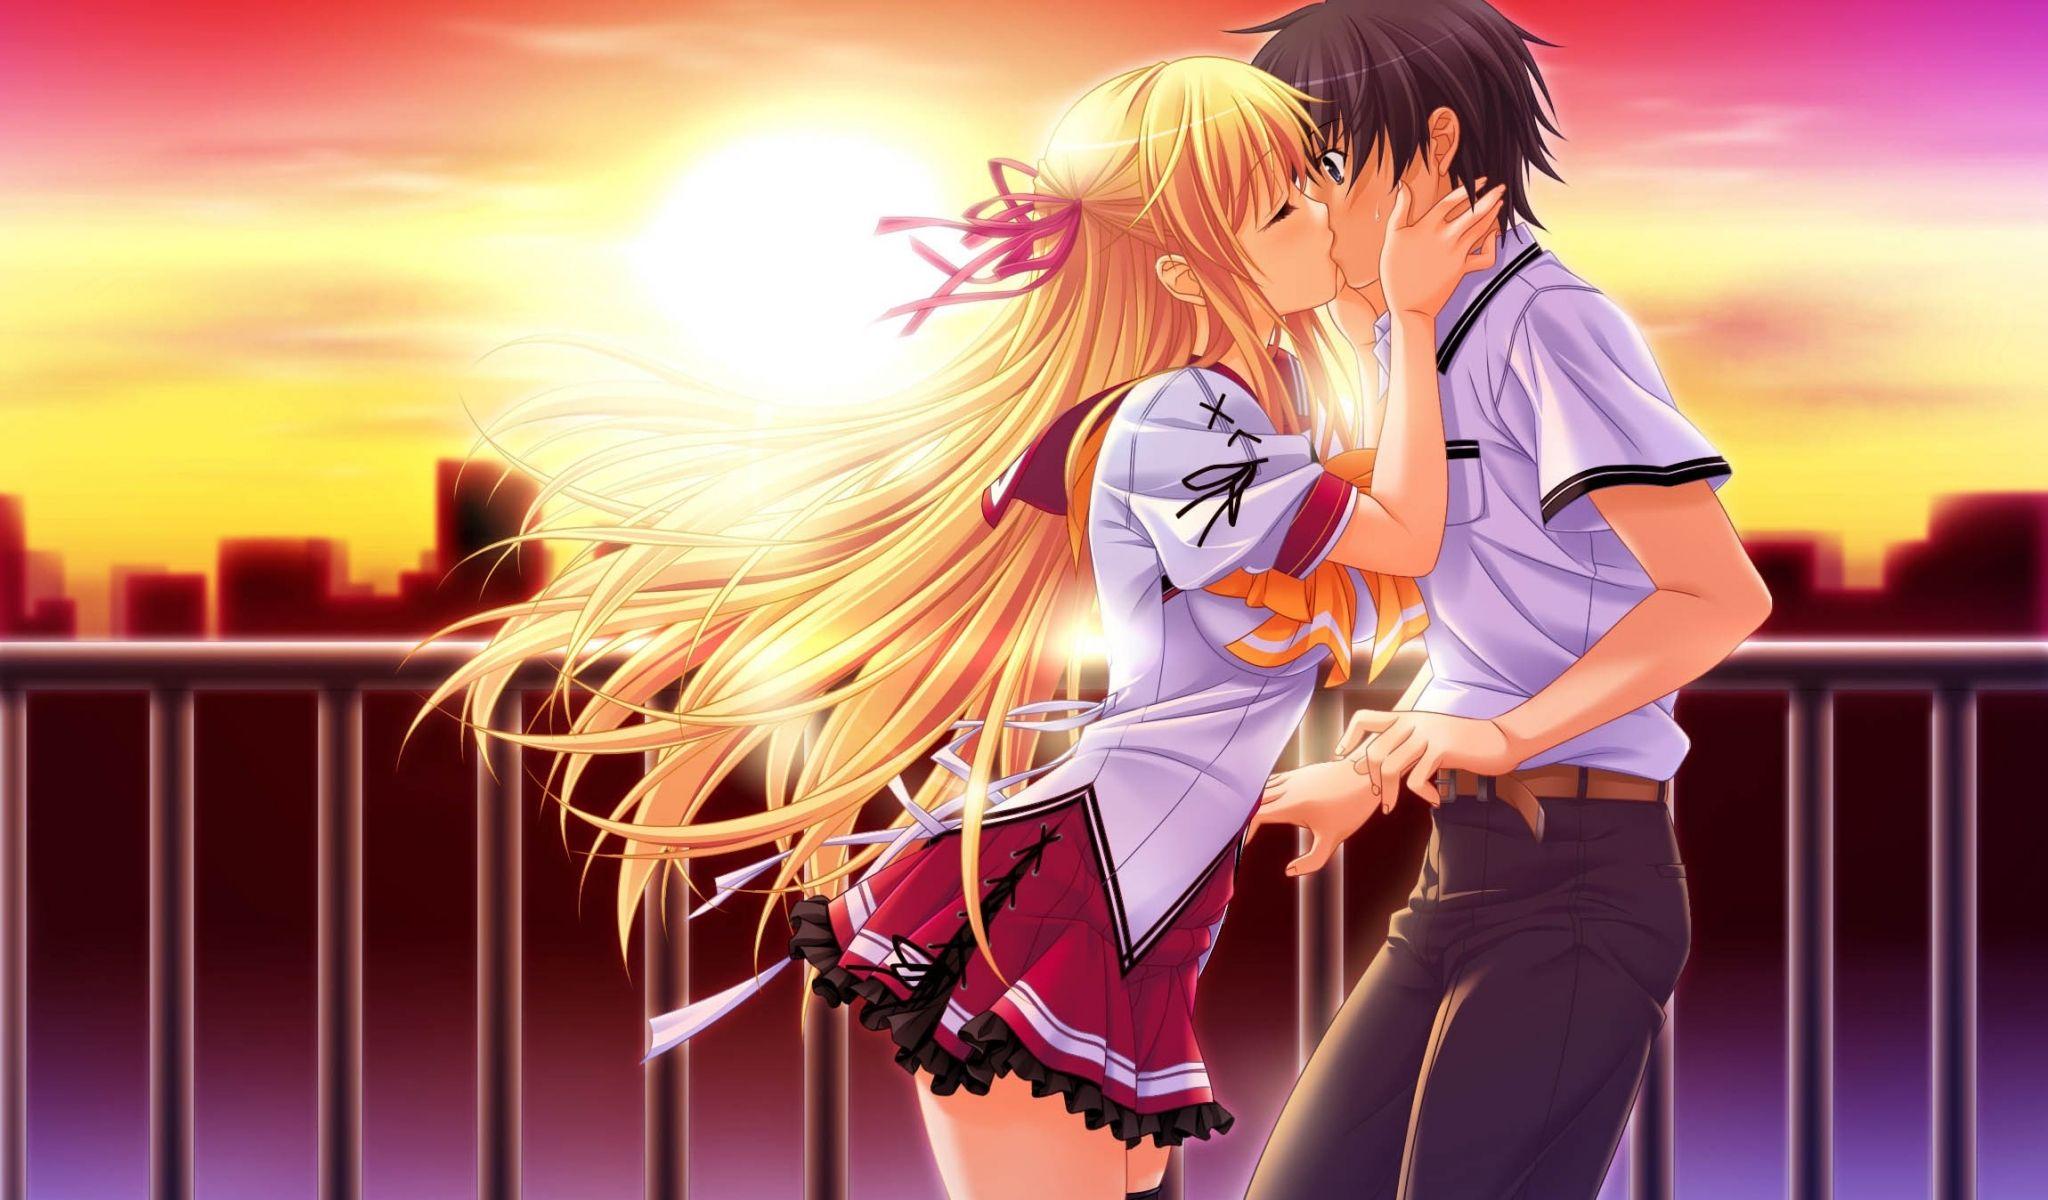 anime girl background wallpaper free | anime*manga*manhwa*nhân vật